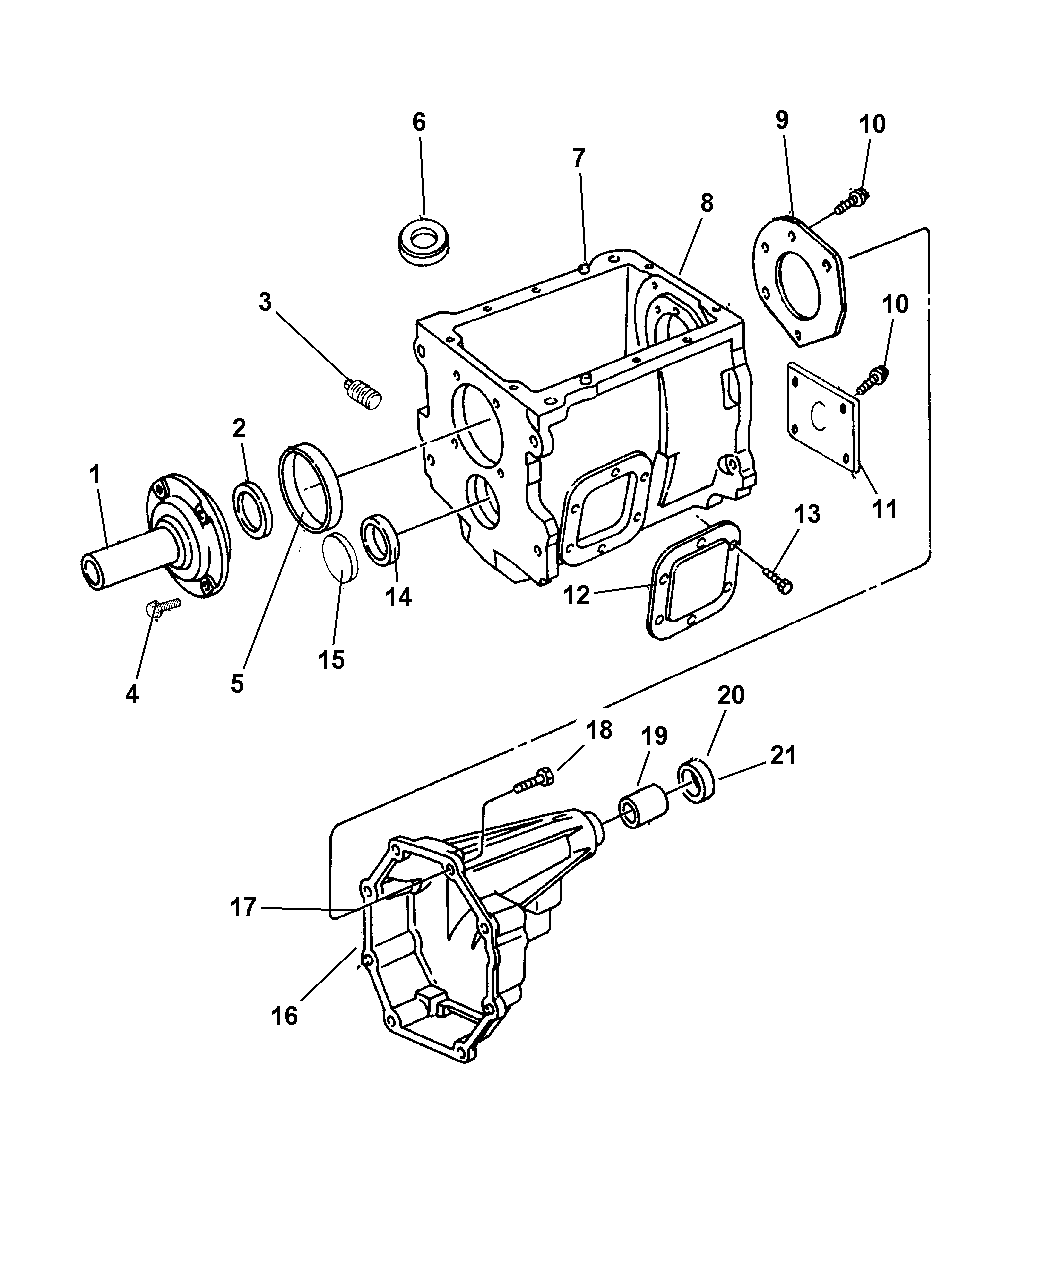 1998 dodge ram 1500 manual transmission